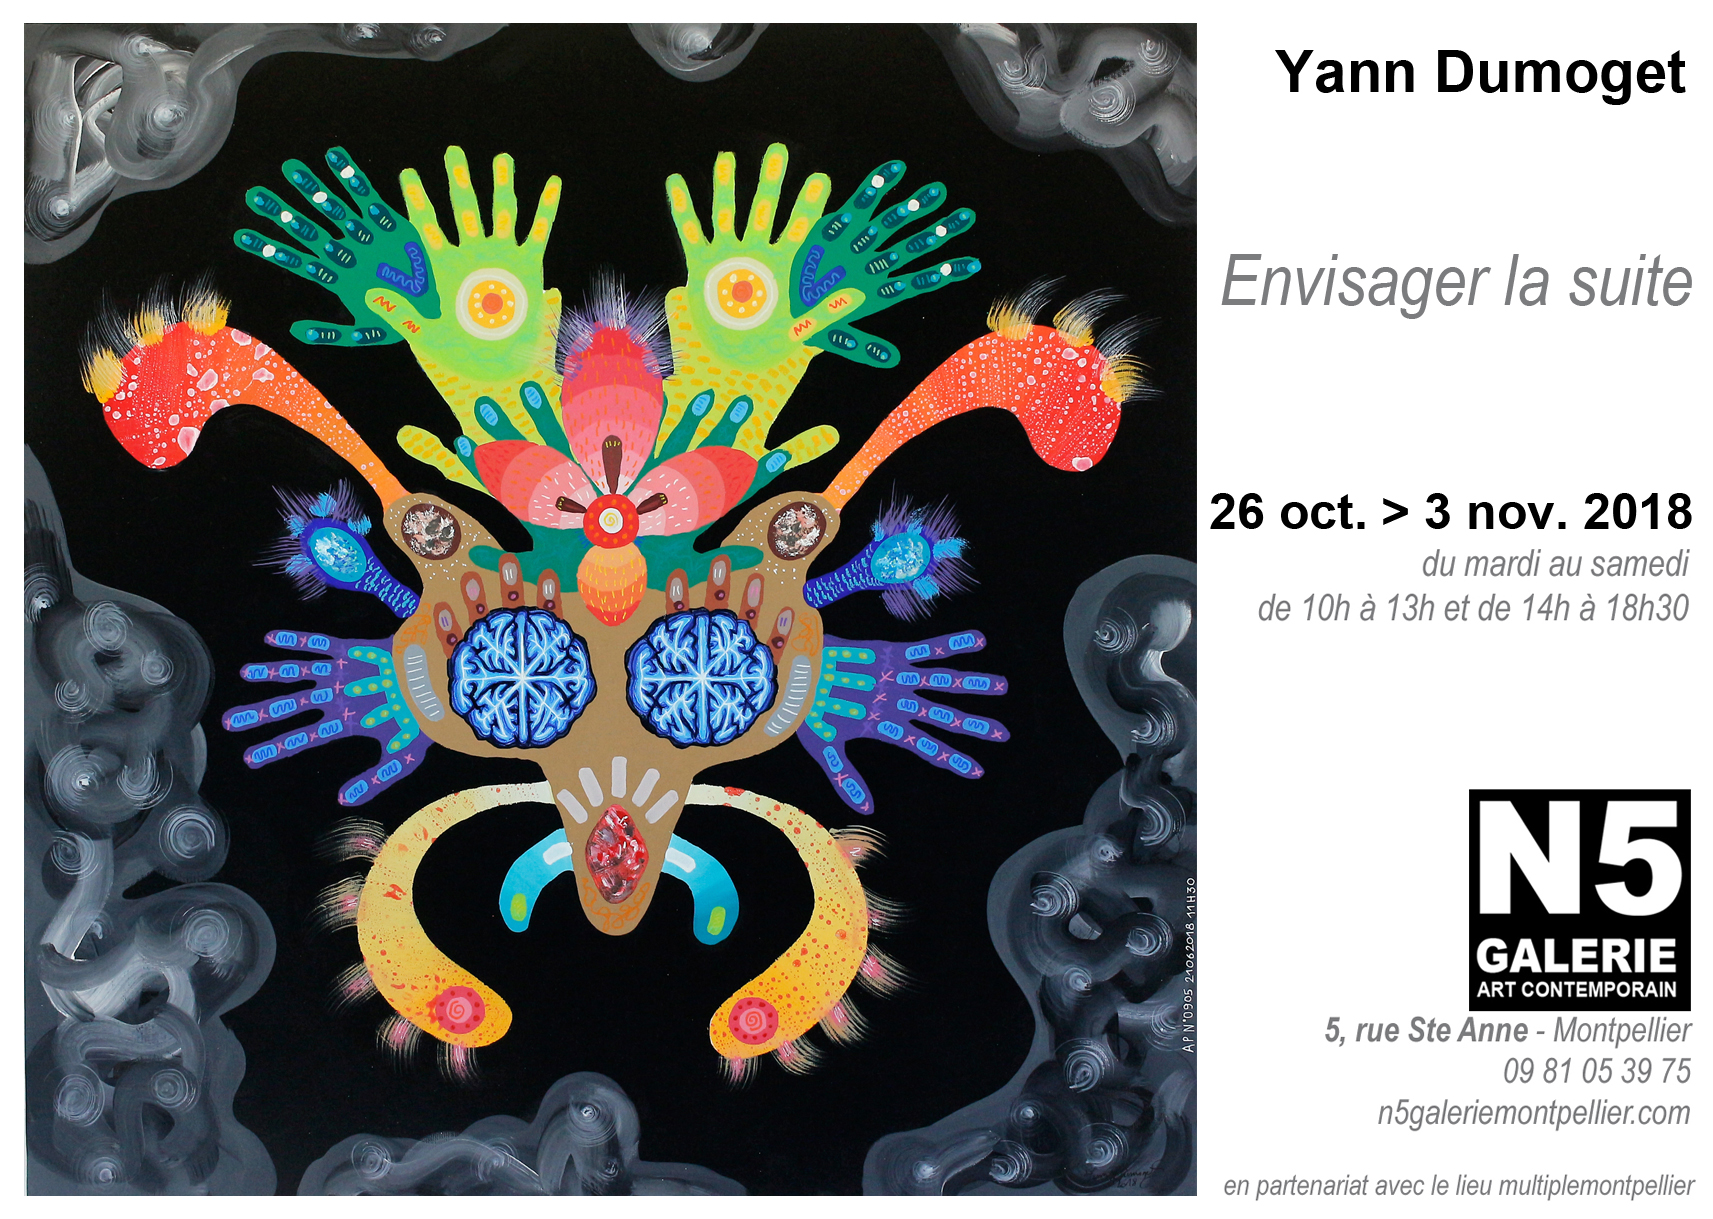 N5 galerie_exposition_Yann Dumoget_peinture_Montpellier_2018